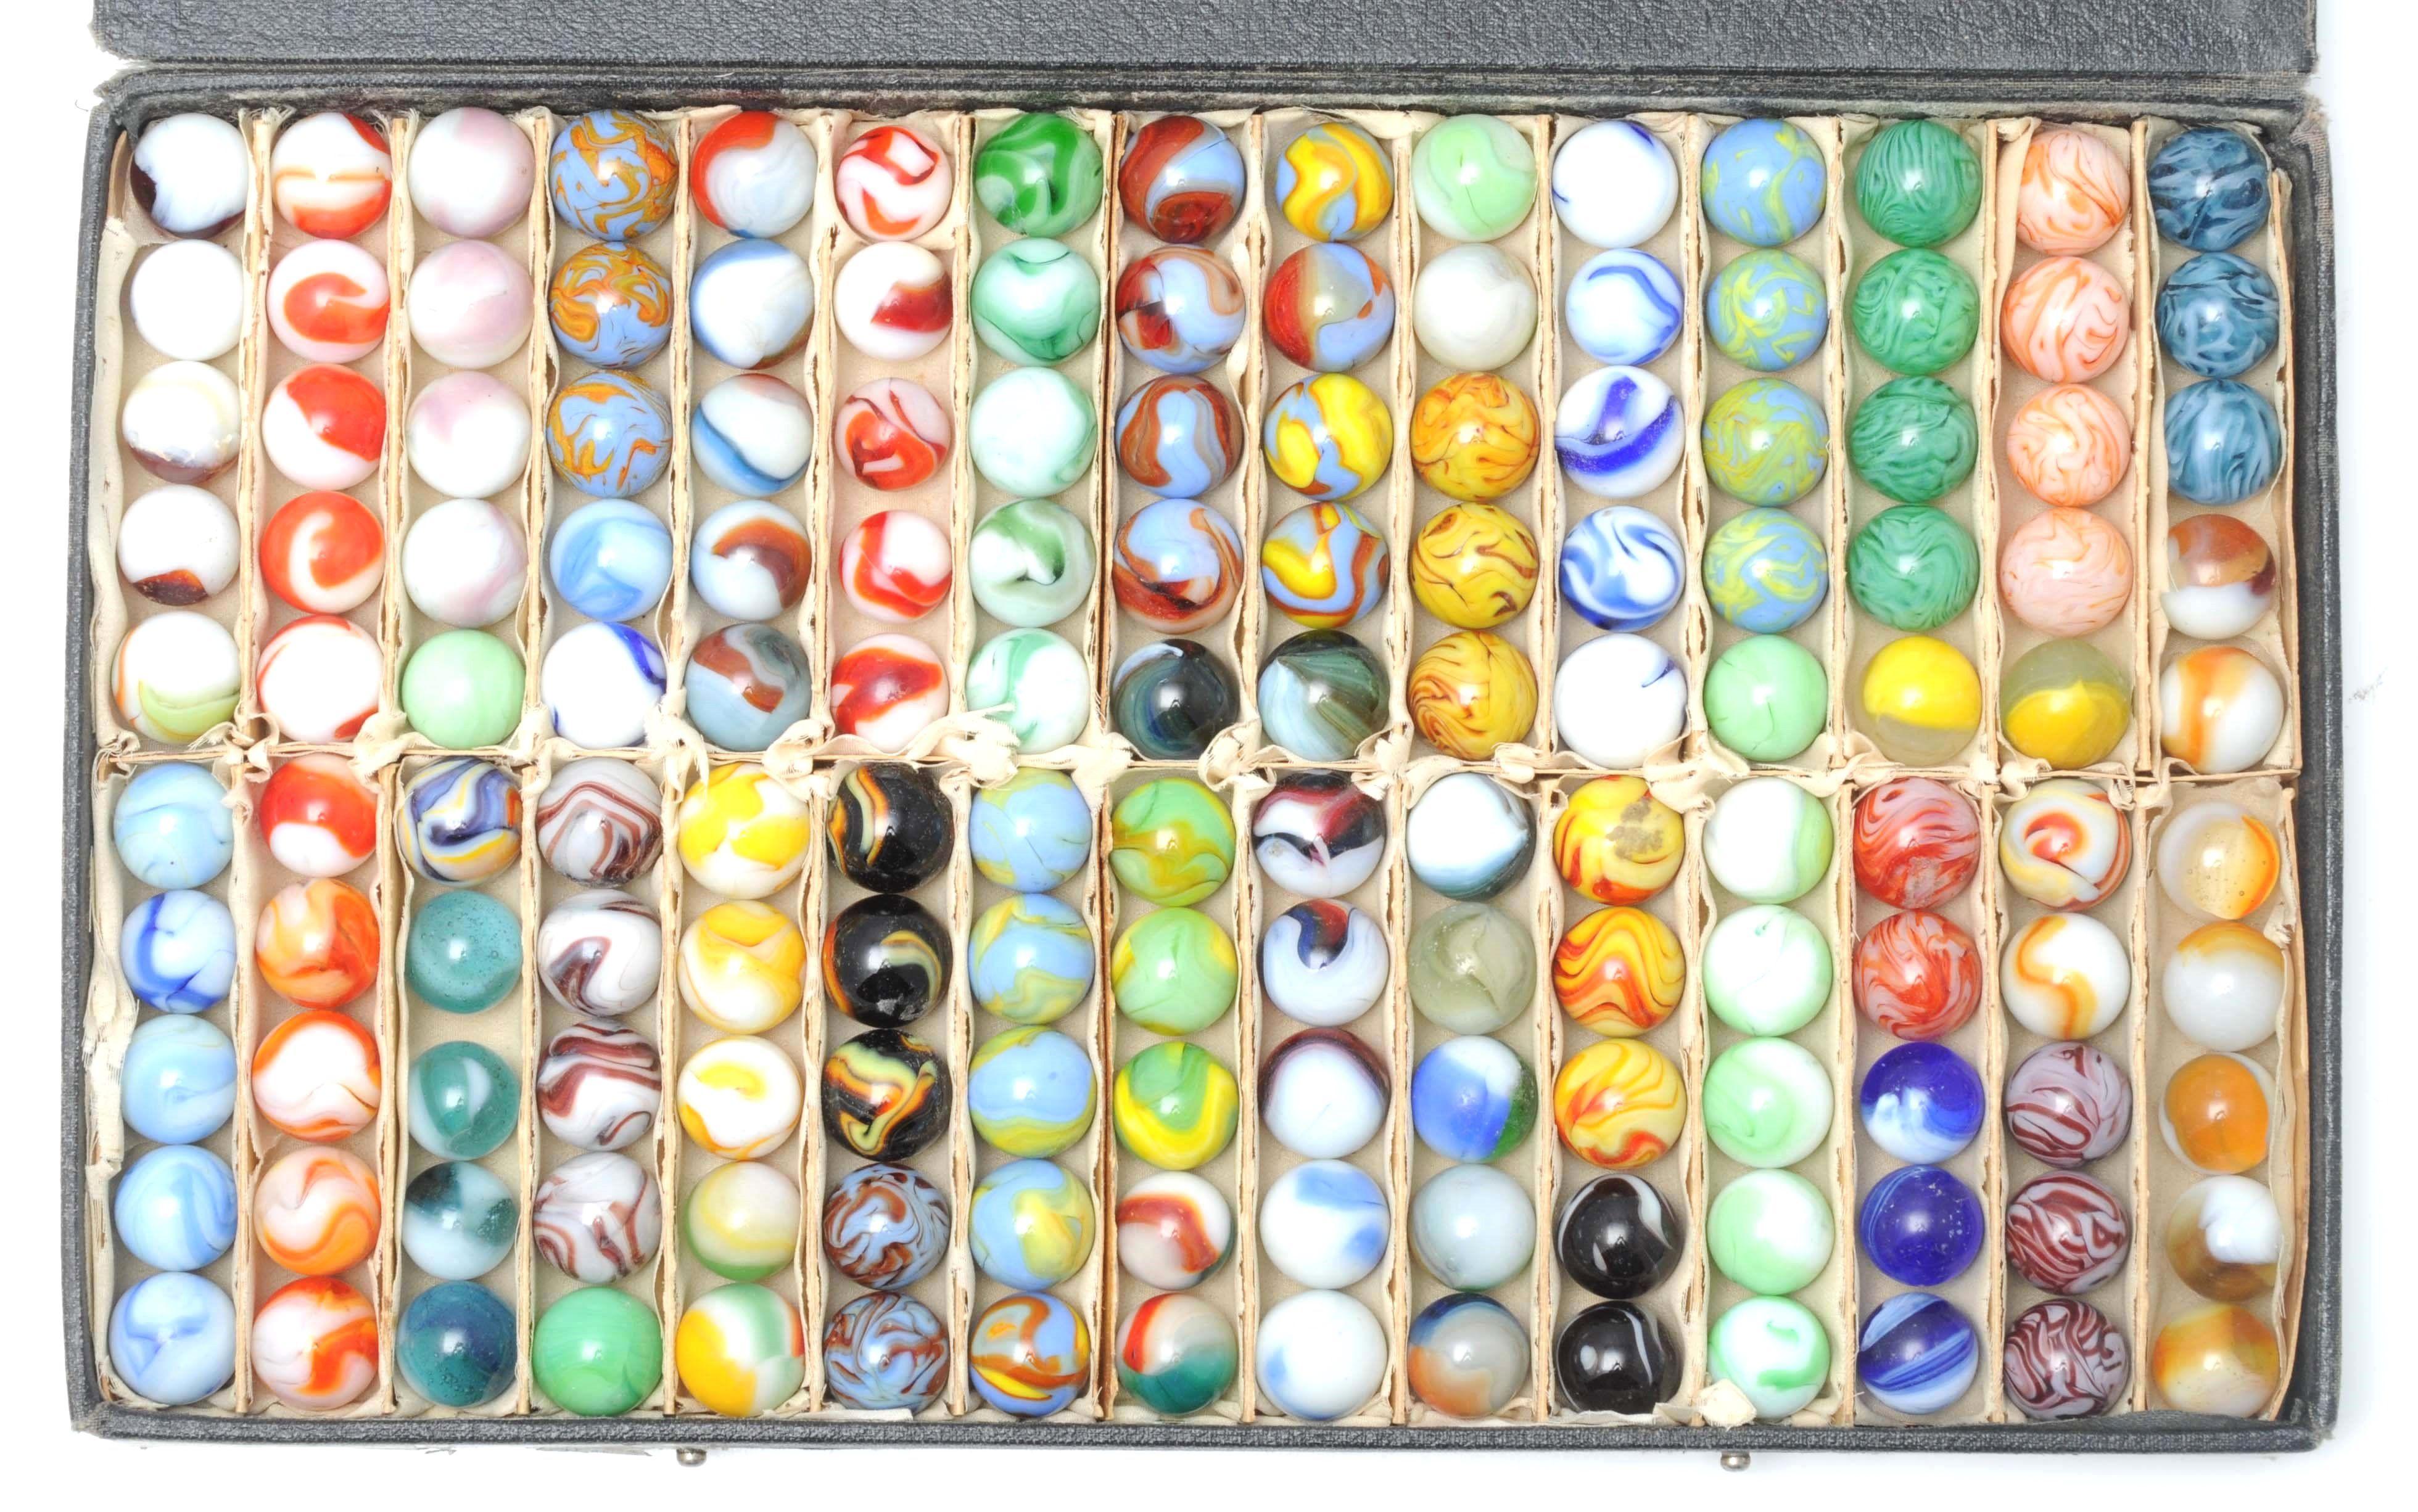 April 19 20 Auction Rare Alley Agate Salesman S Sample Marble Case Salesman S Sample Case Has 30 Separate Compartments Containin Marble Marble Case Auction